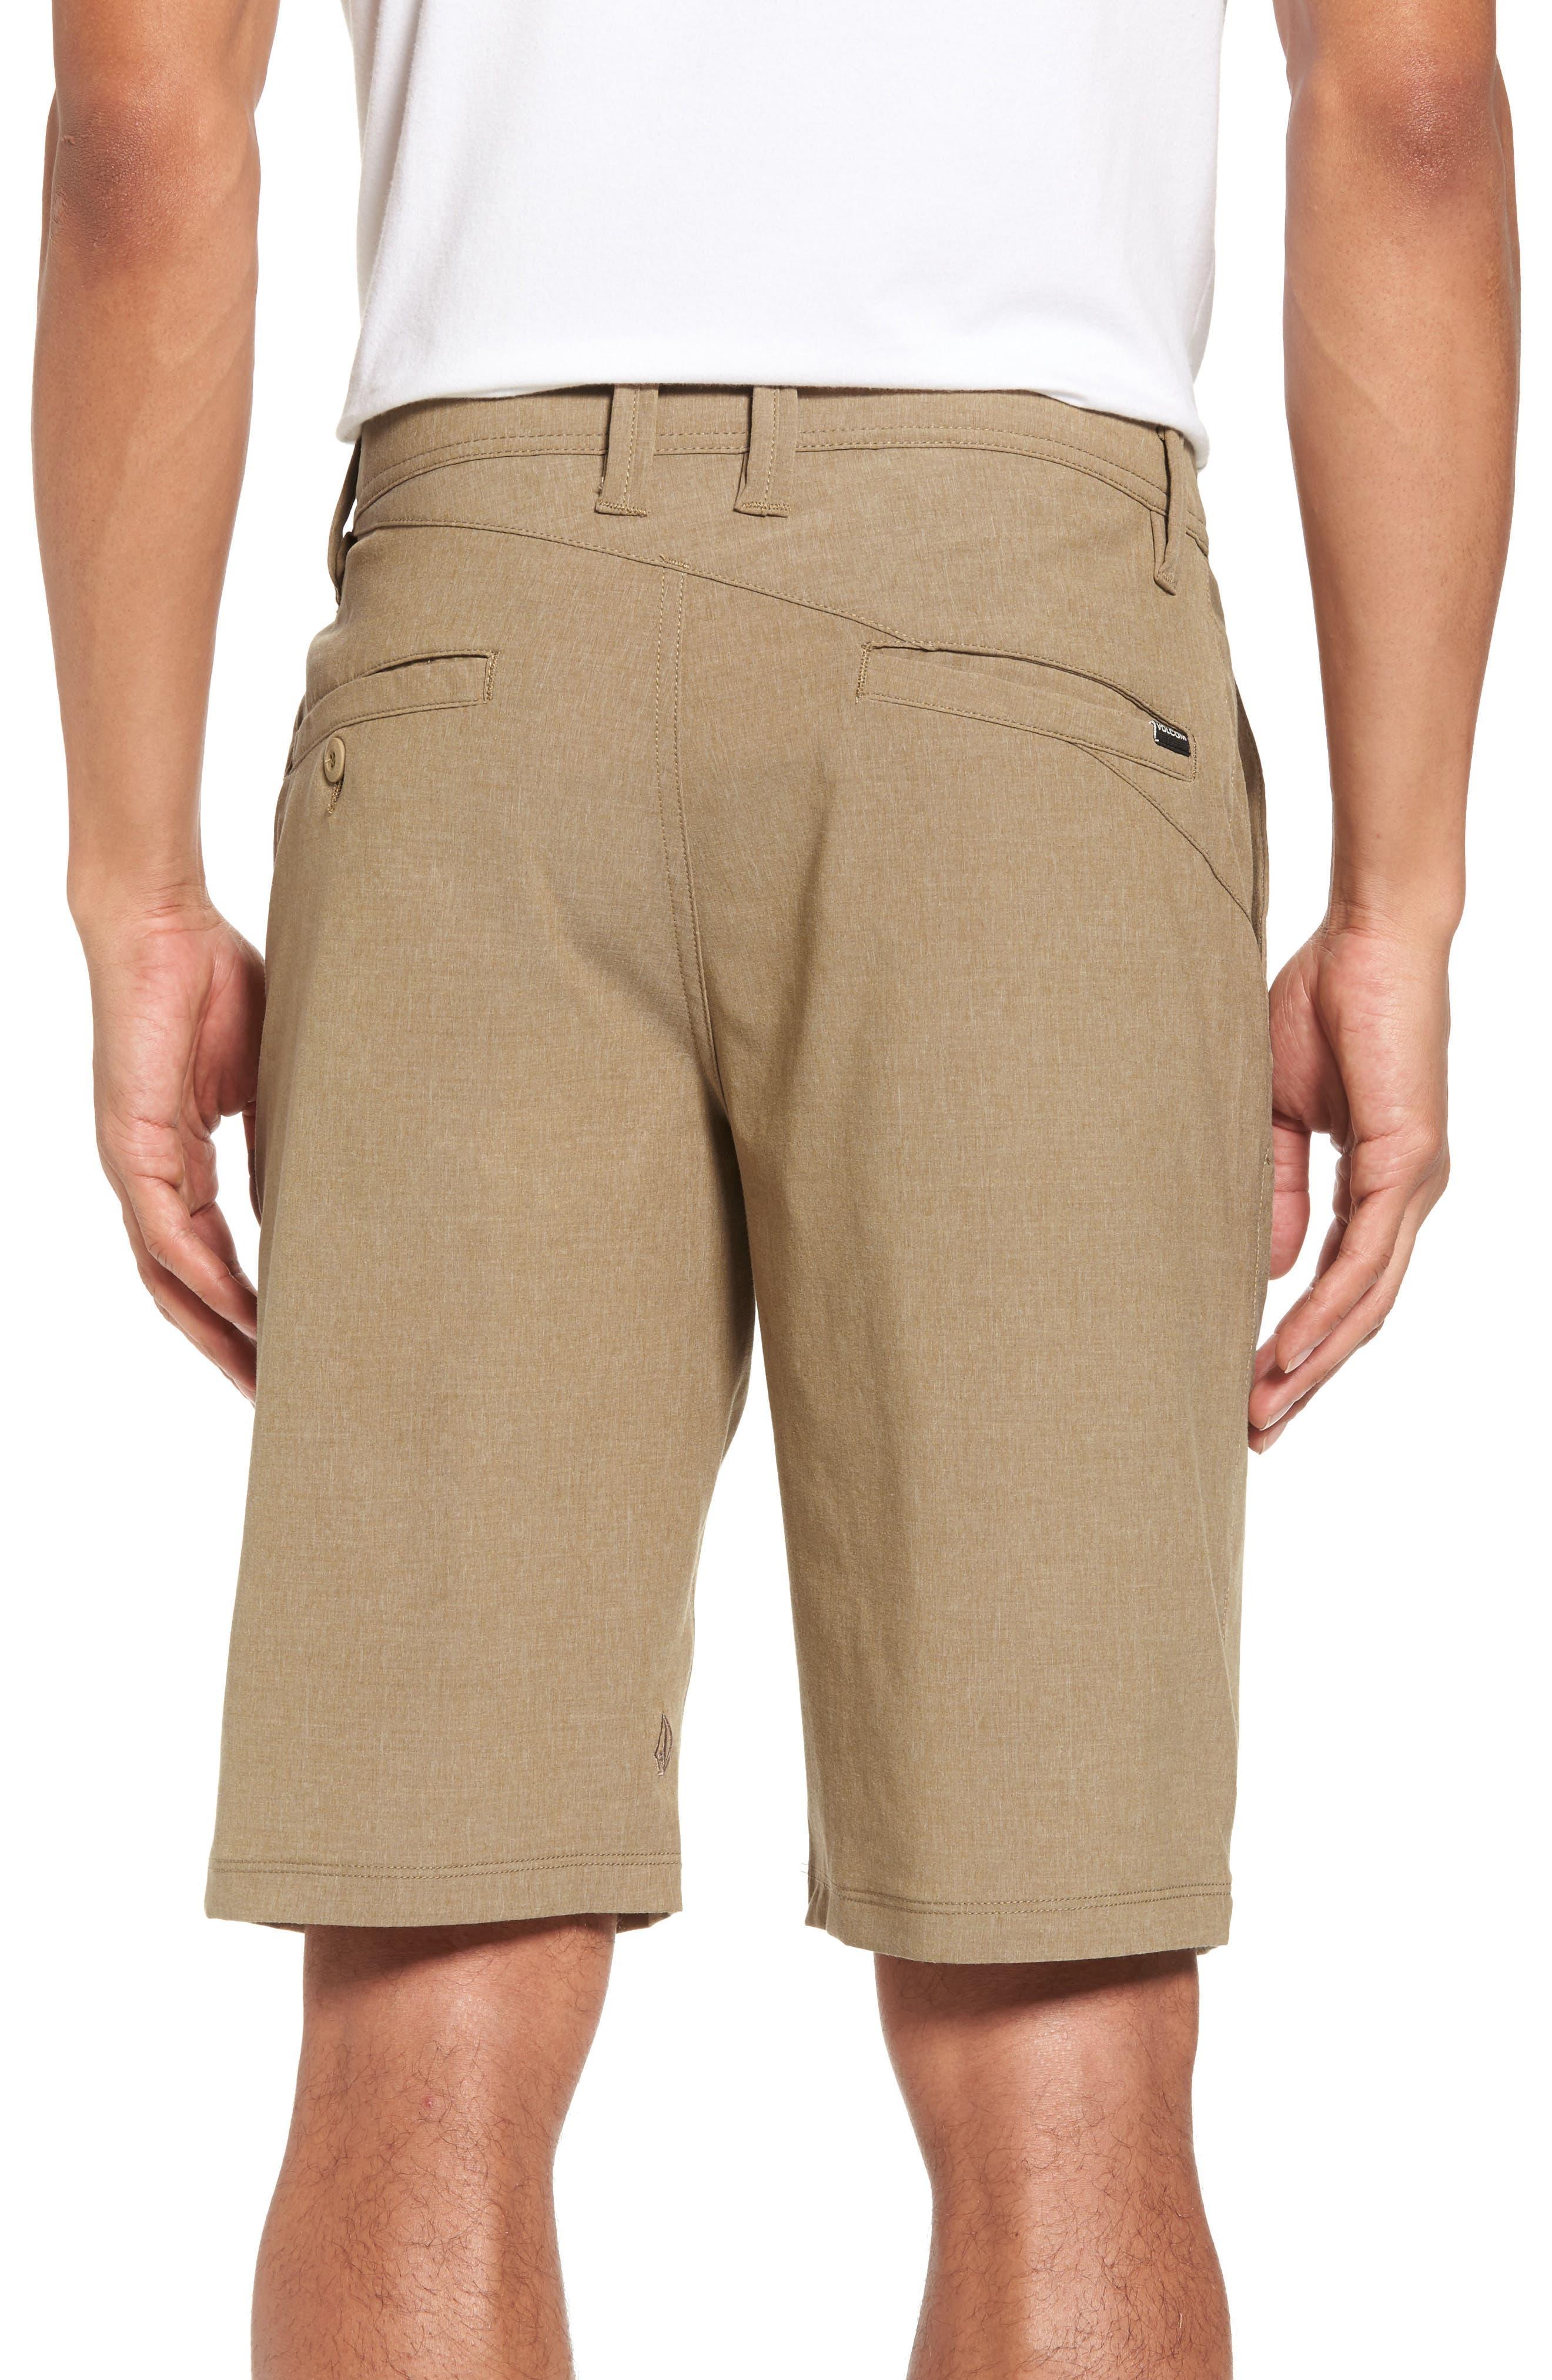 Hybrid Shorts,                             Alternate thumbnail 2, color,                             BEIGE